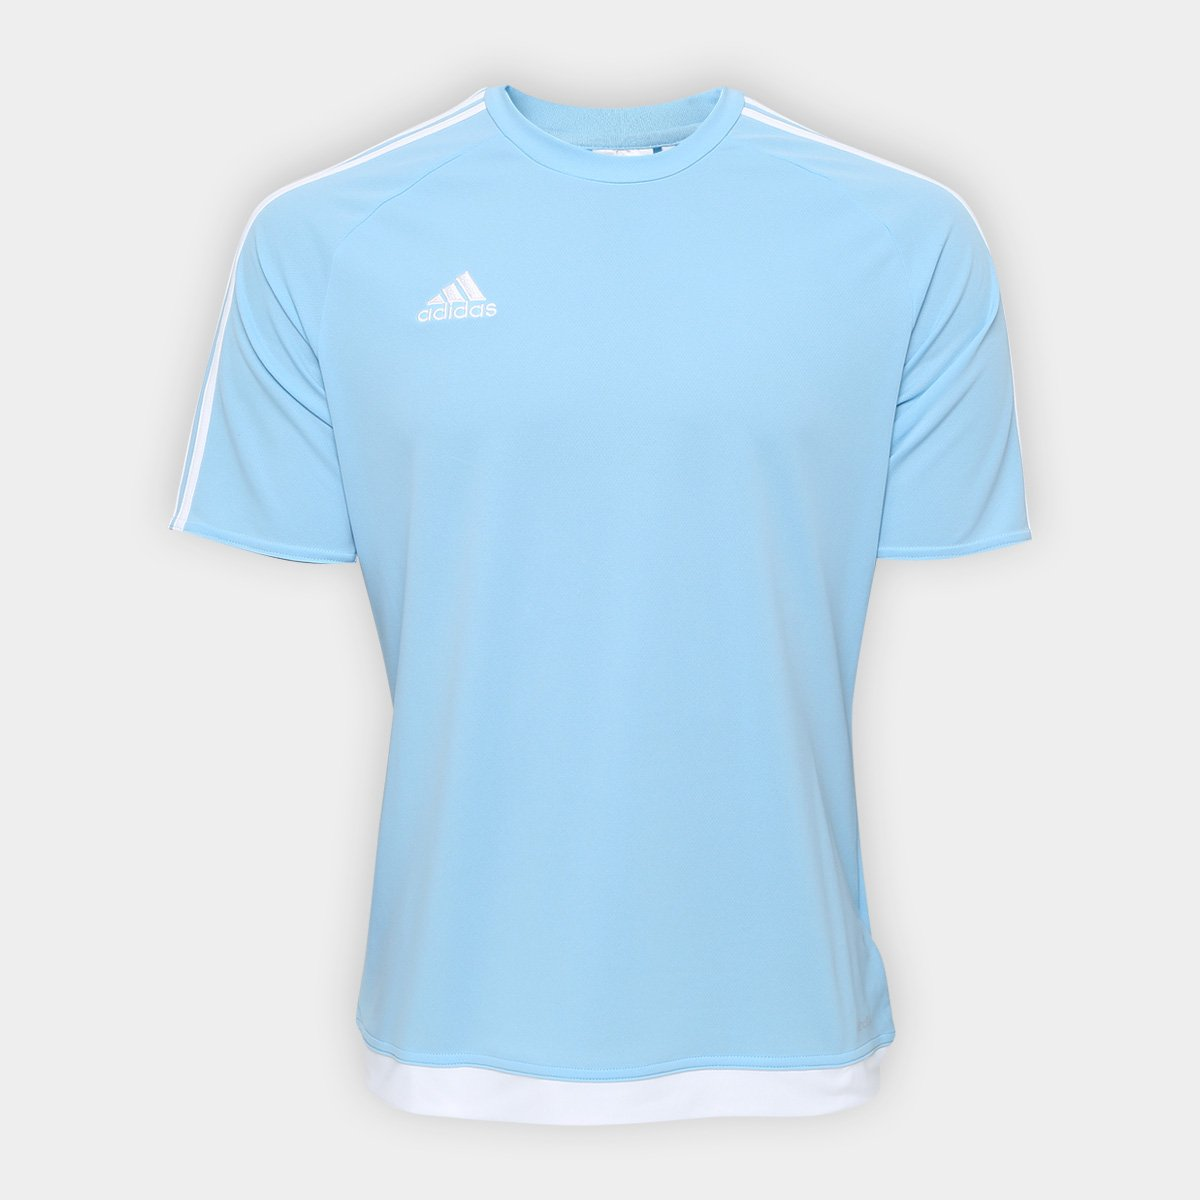 dbedb9b16b287 Camisa Adidas Estro 15 Masculina - Azul Claro - Compre Agora